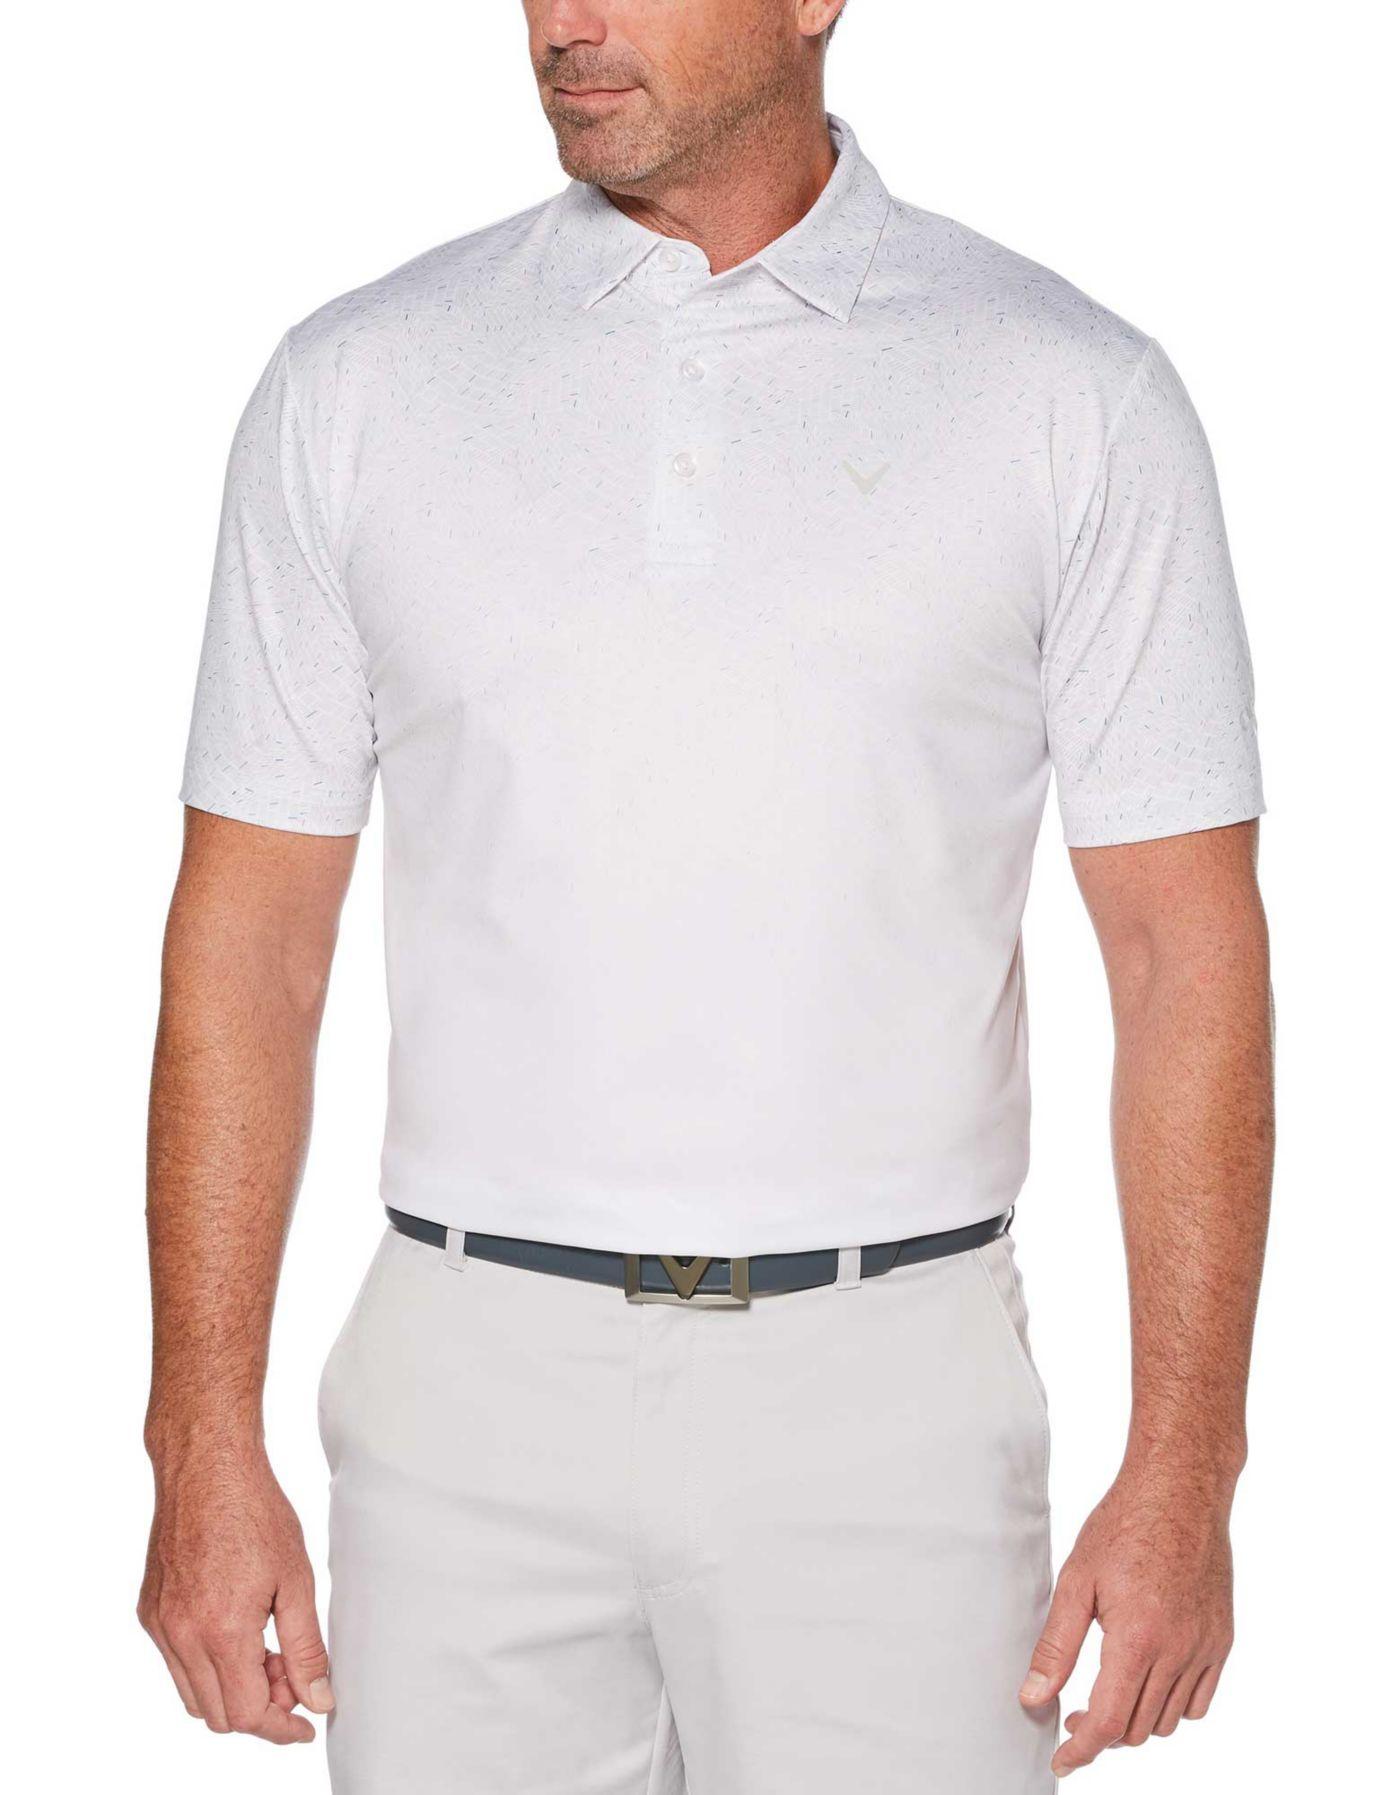 Callaway Men's Motion Print Golf Polo